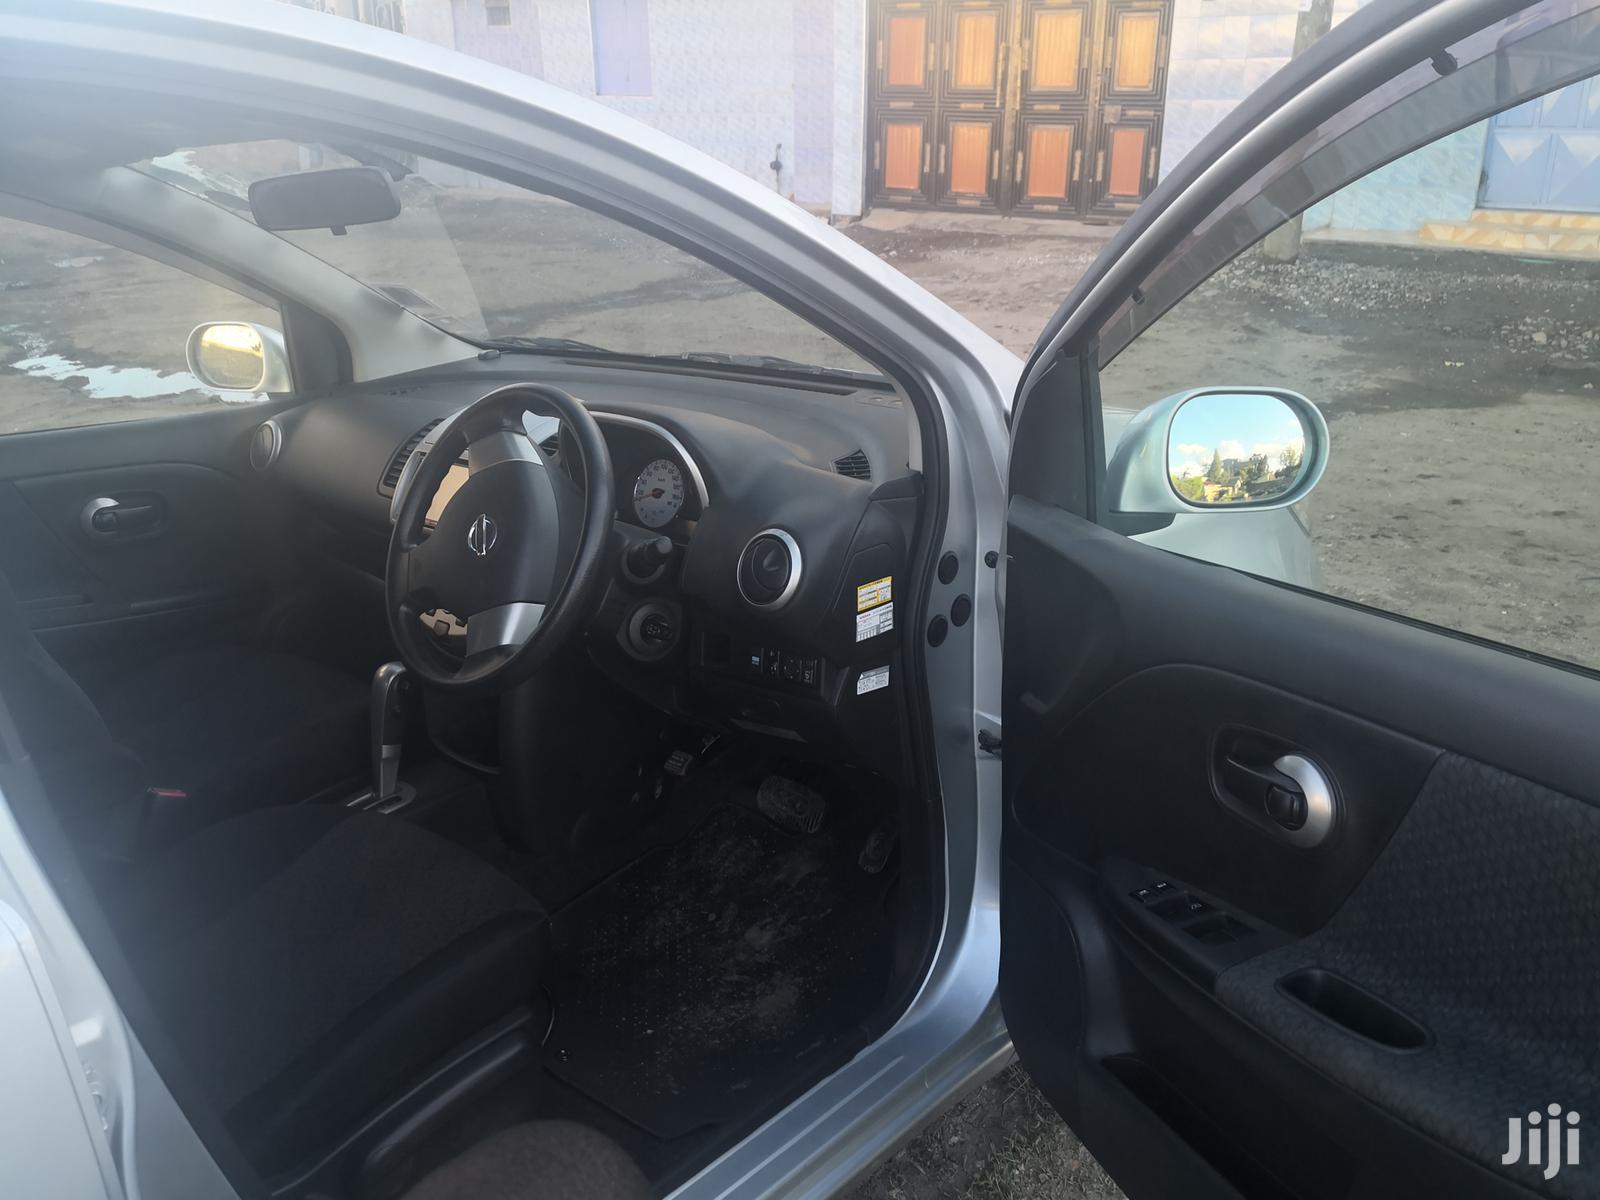 New Nissan Note 1.4 2012 Silver | Cars for sale in Embakasi, Nairobi, Kenya